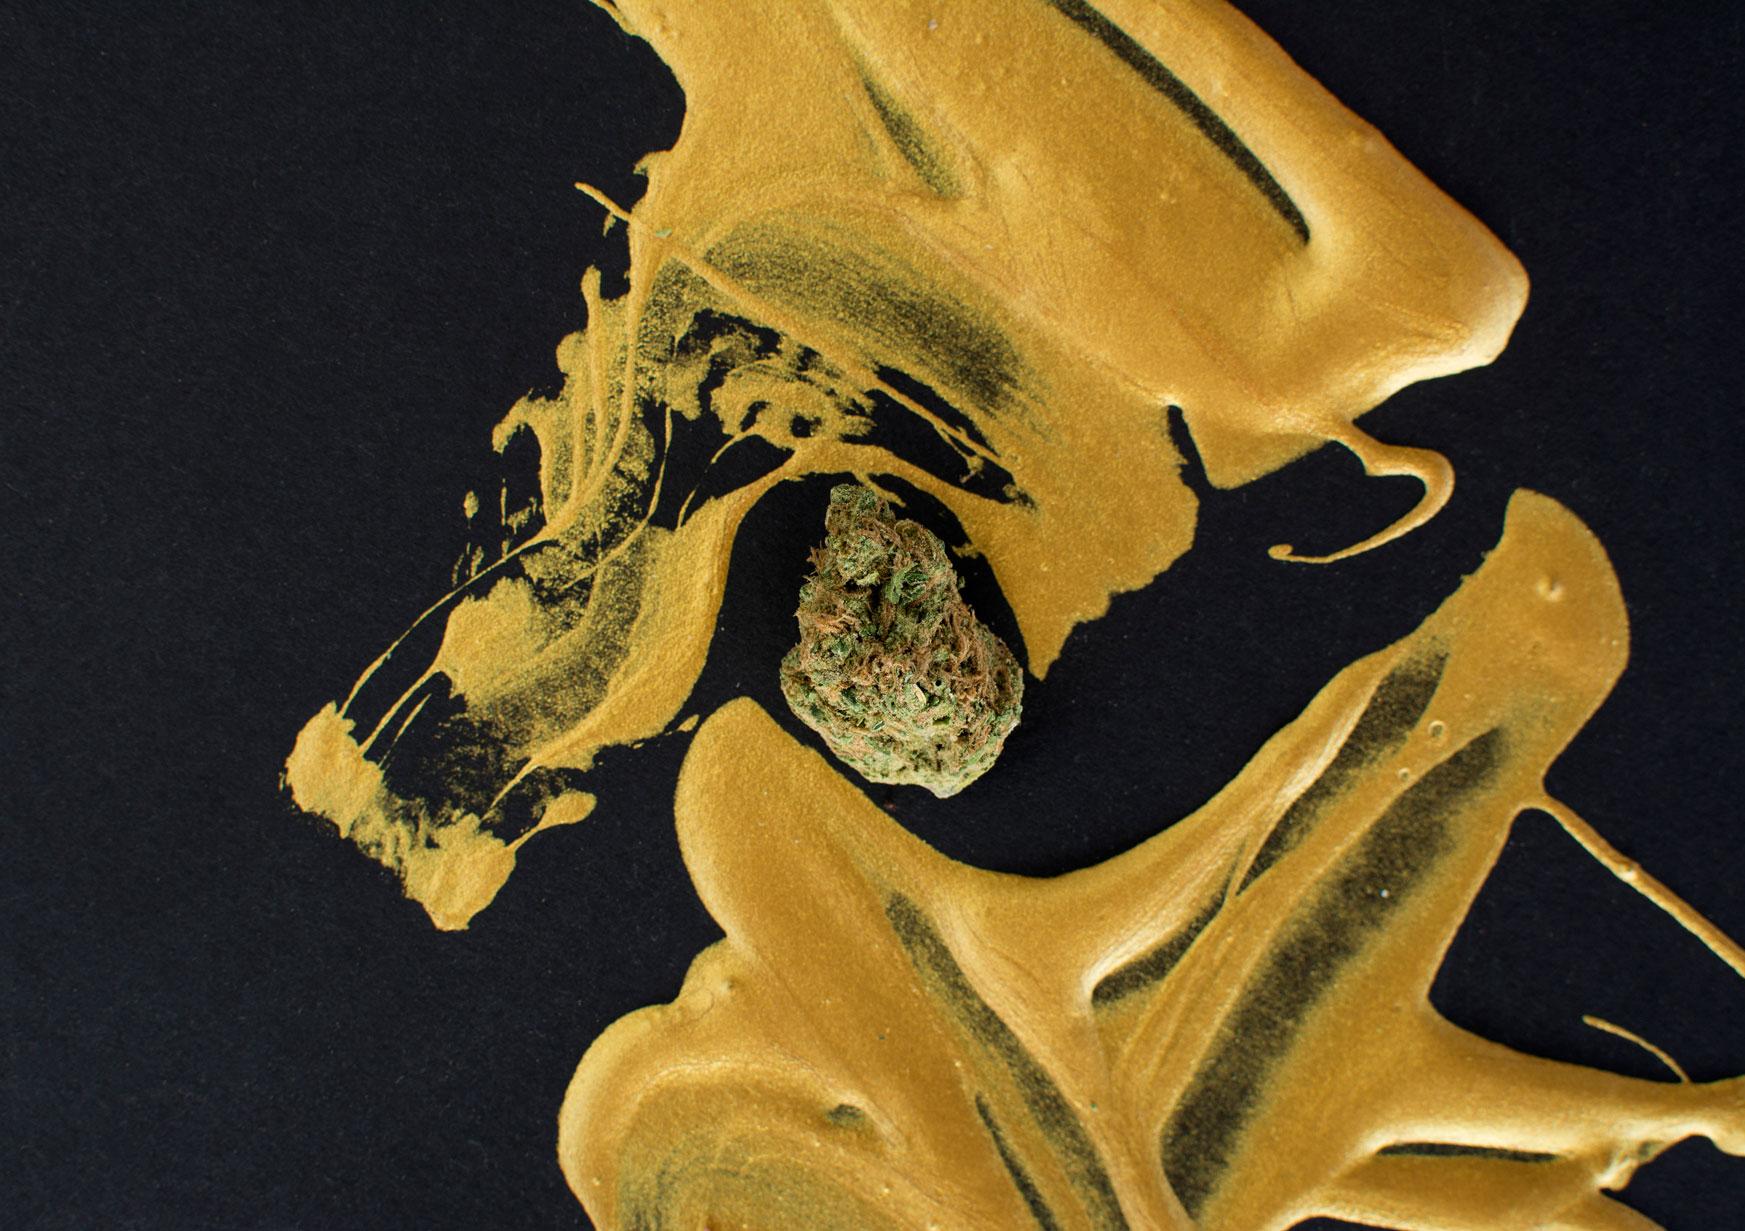 gold-puddle-greenandgold.jpg